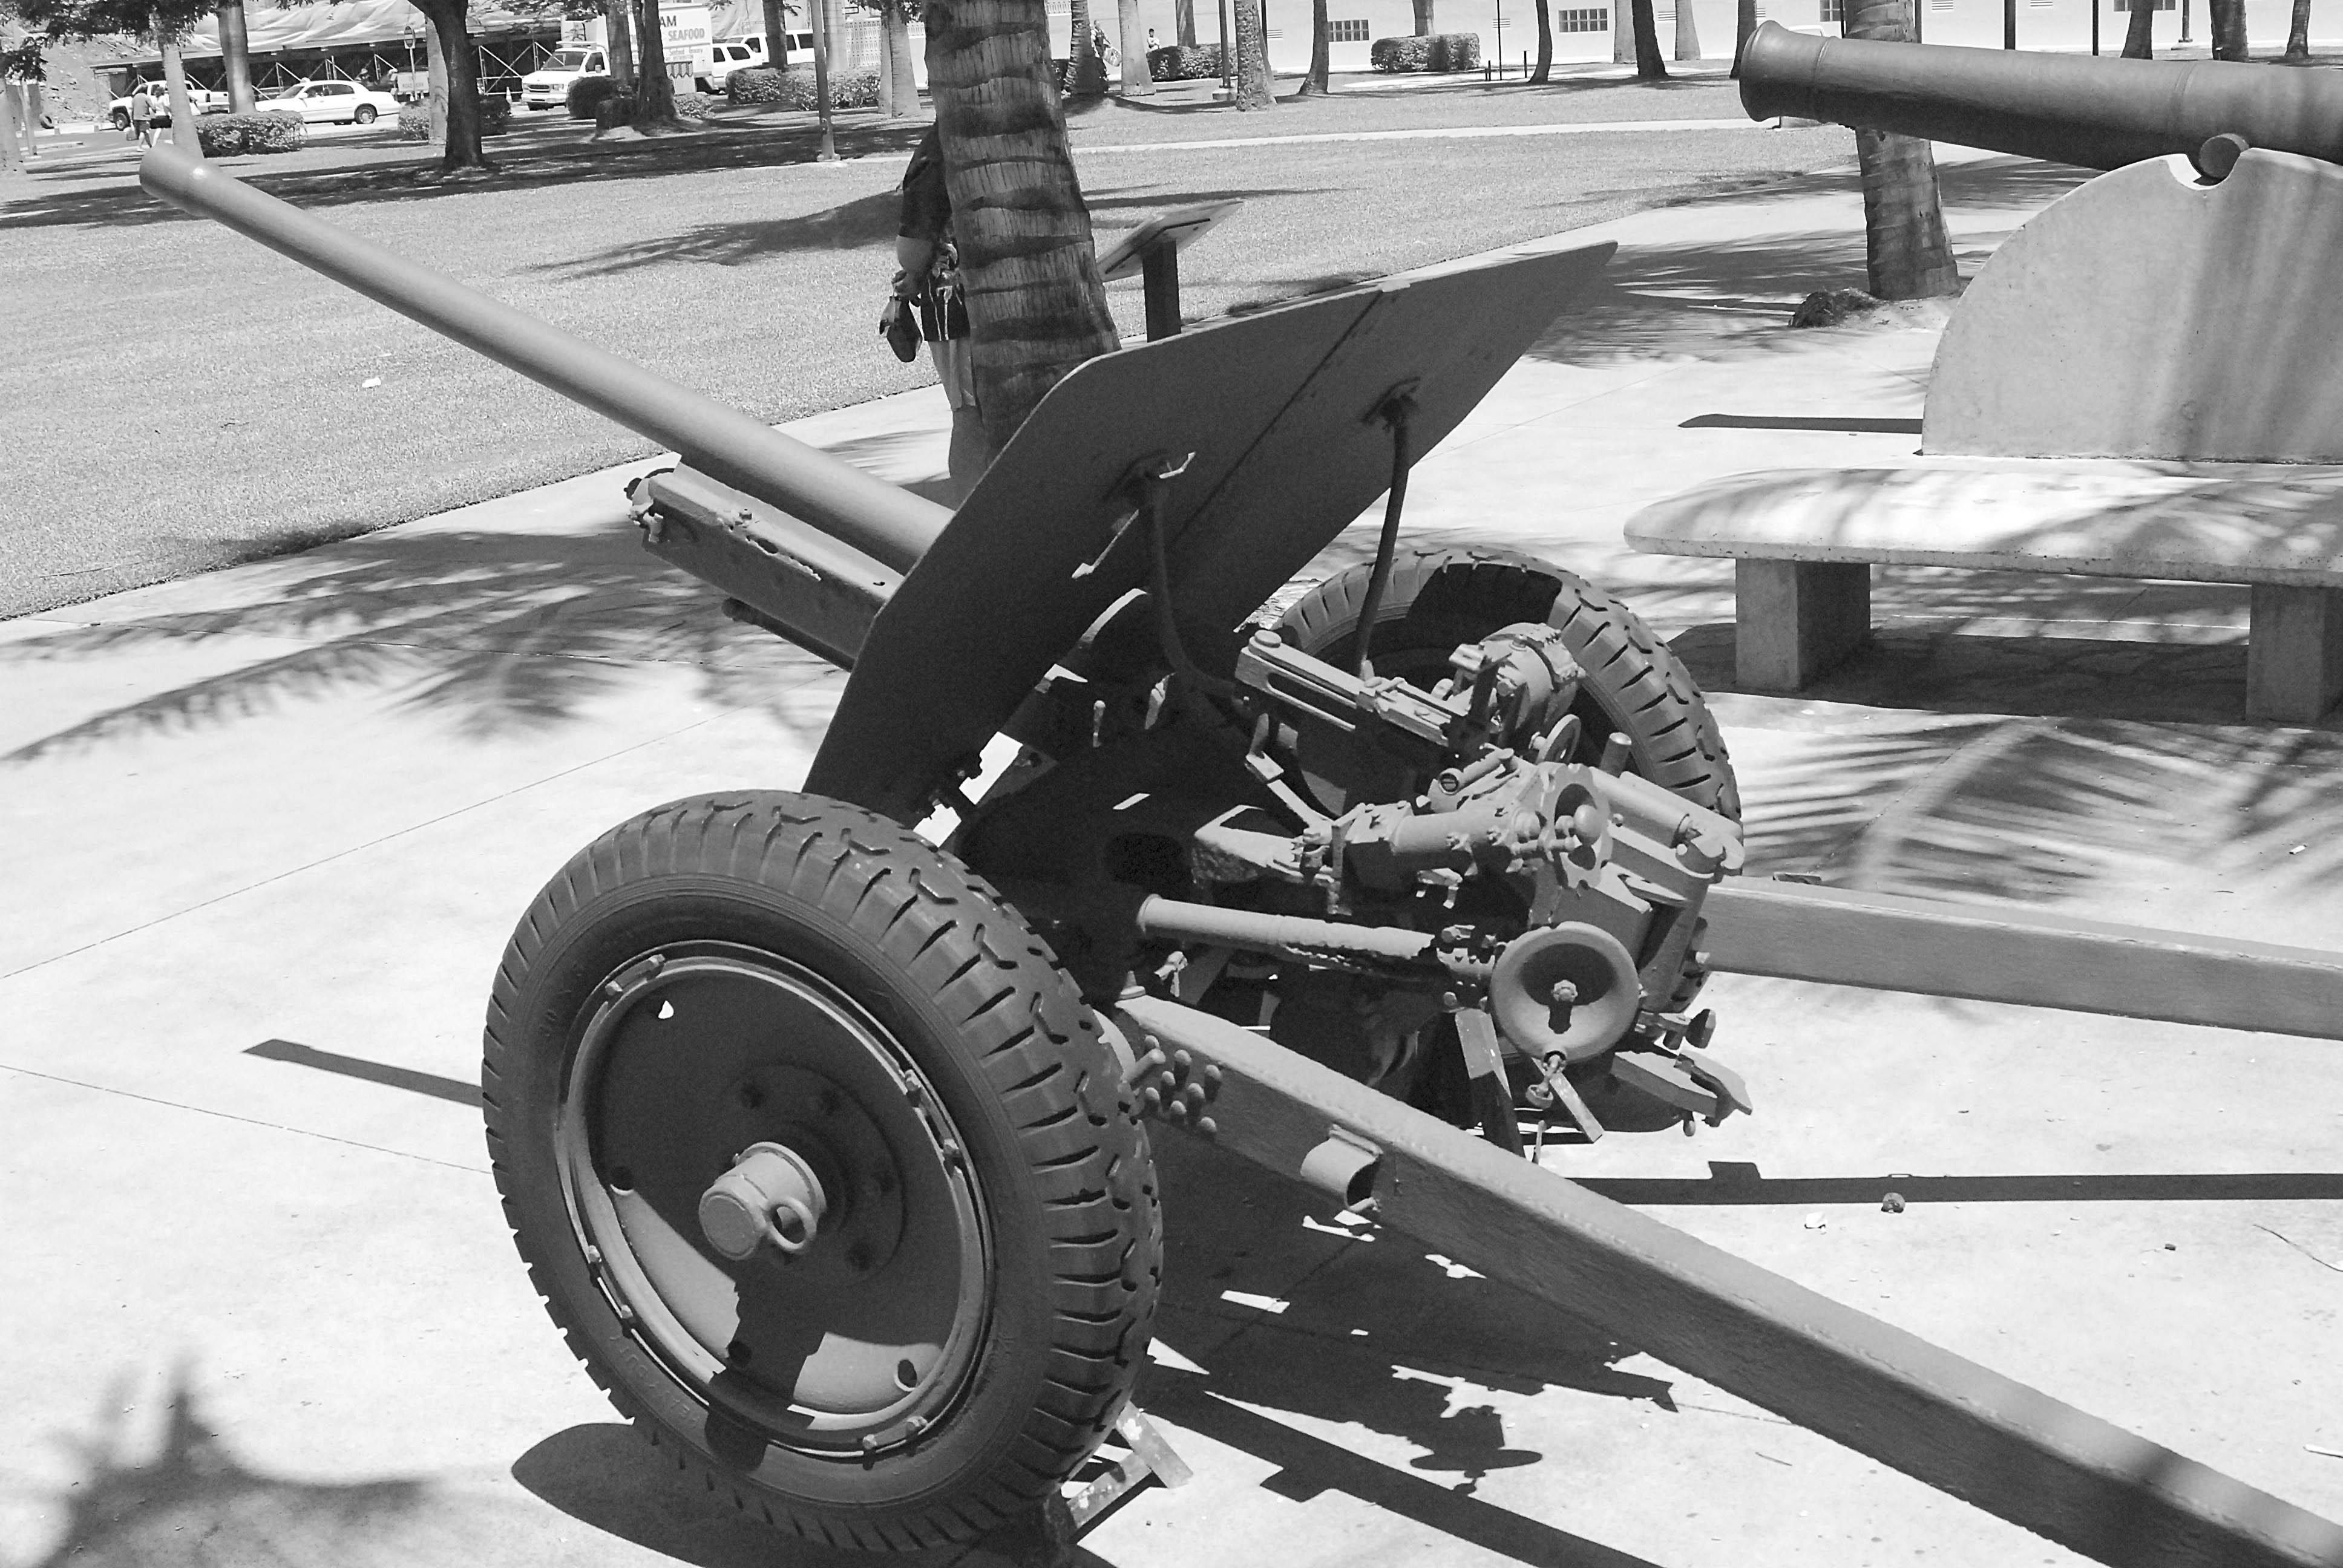 German 50 Mm Anti Tank Gun: Weapons And Warfare